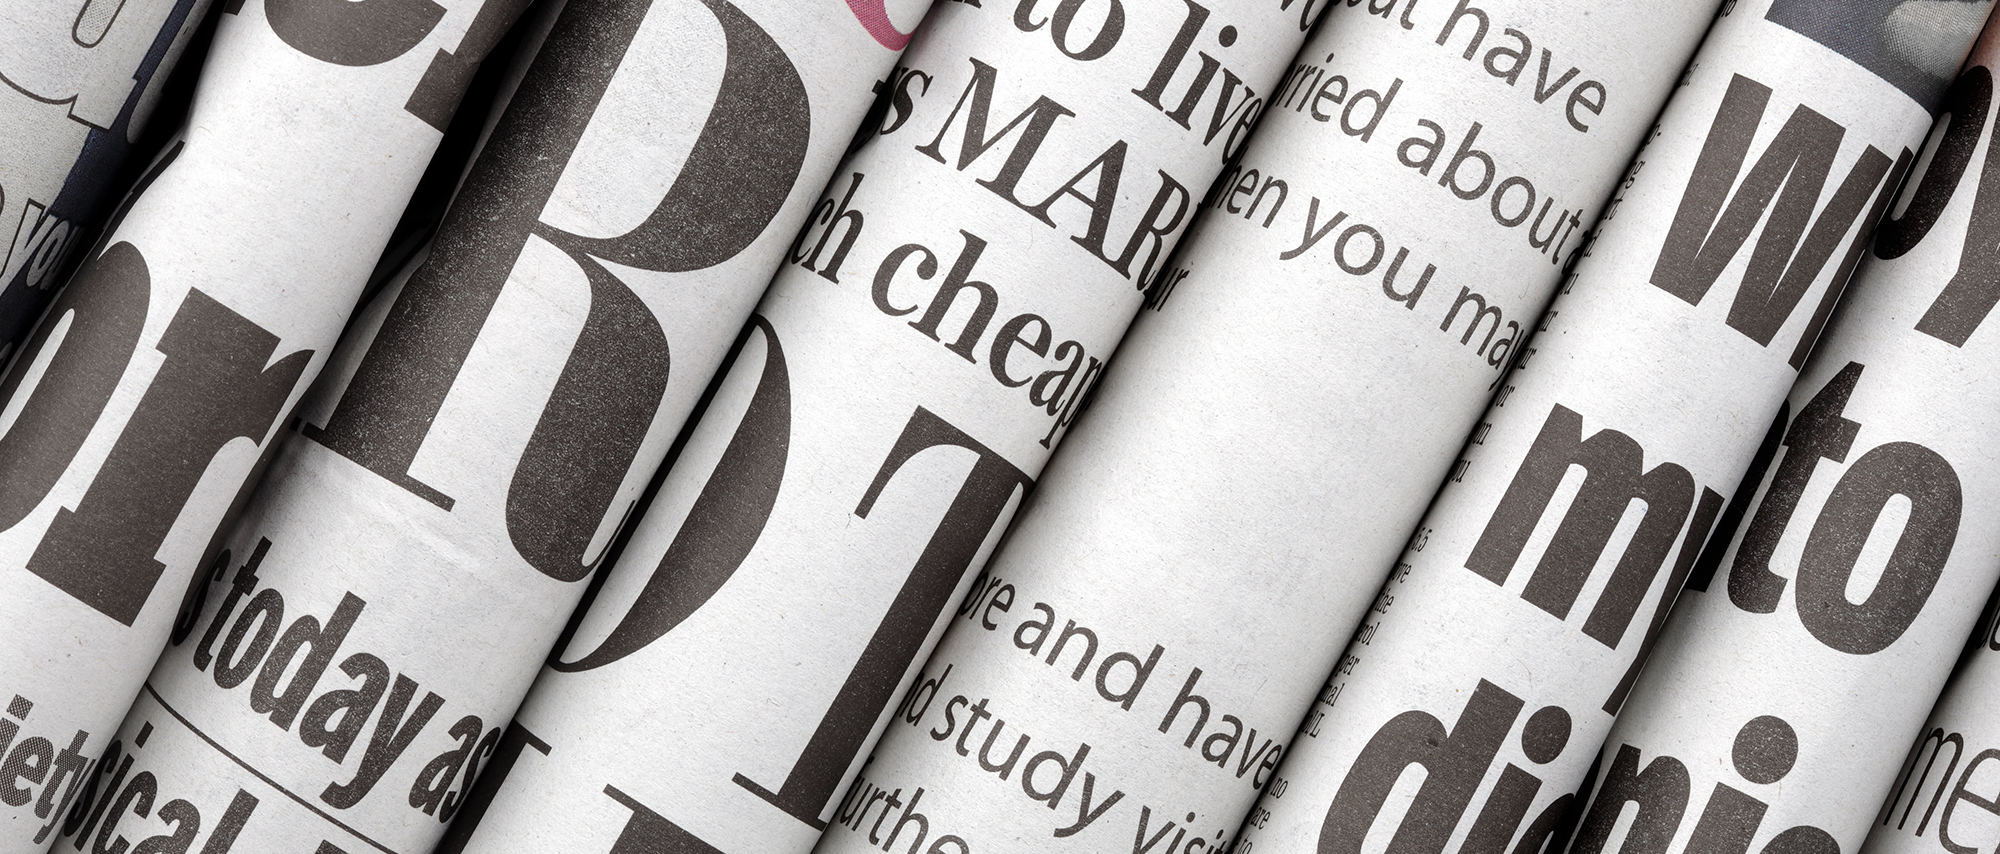 newspaper background, newspaper, english, letter background image